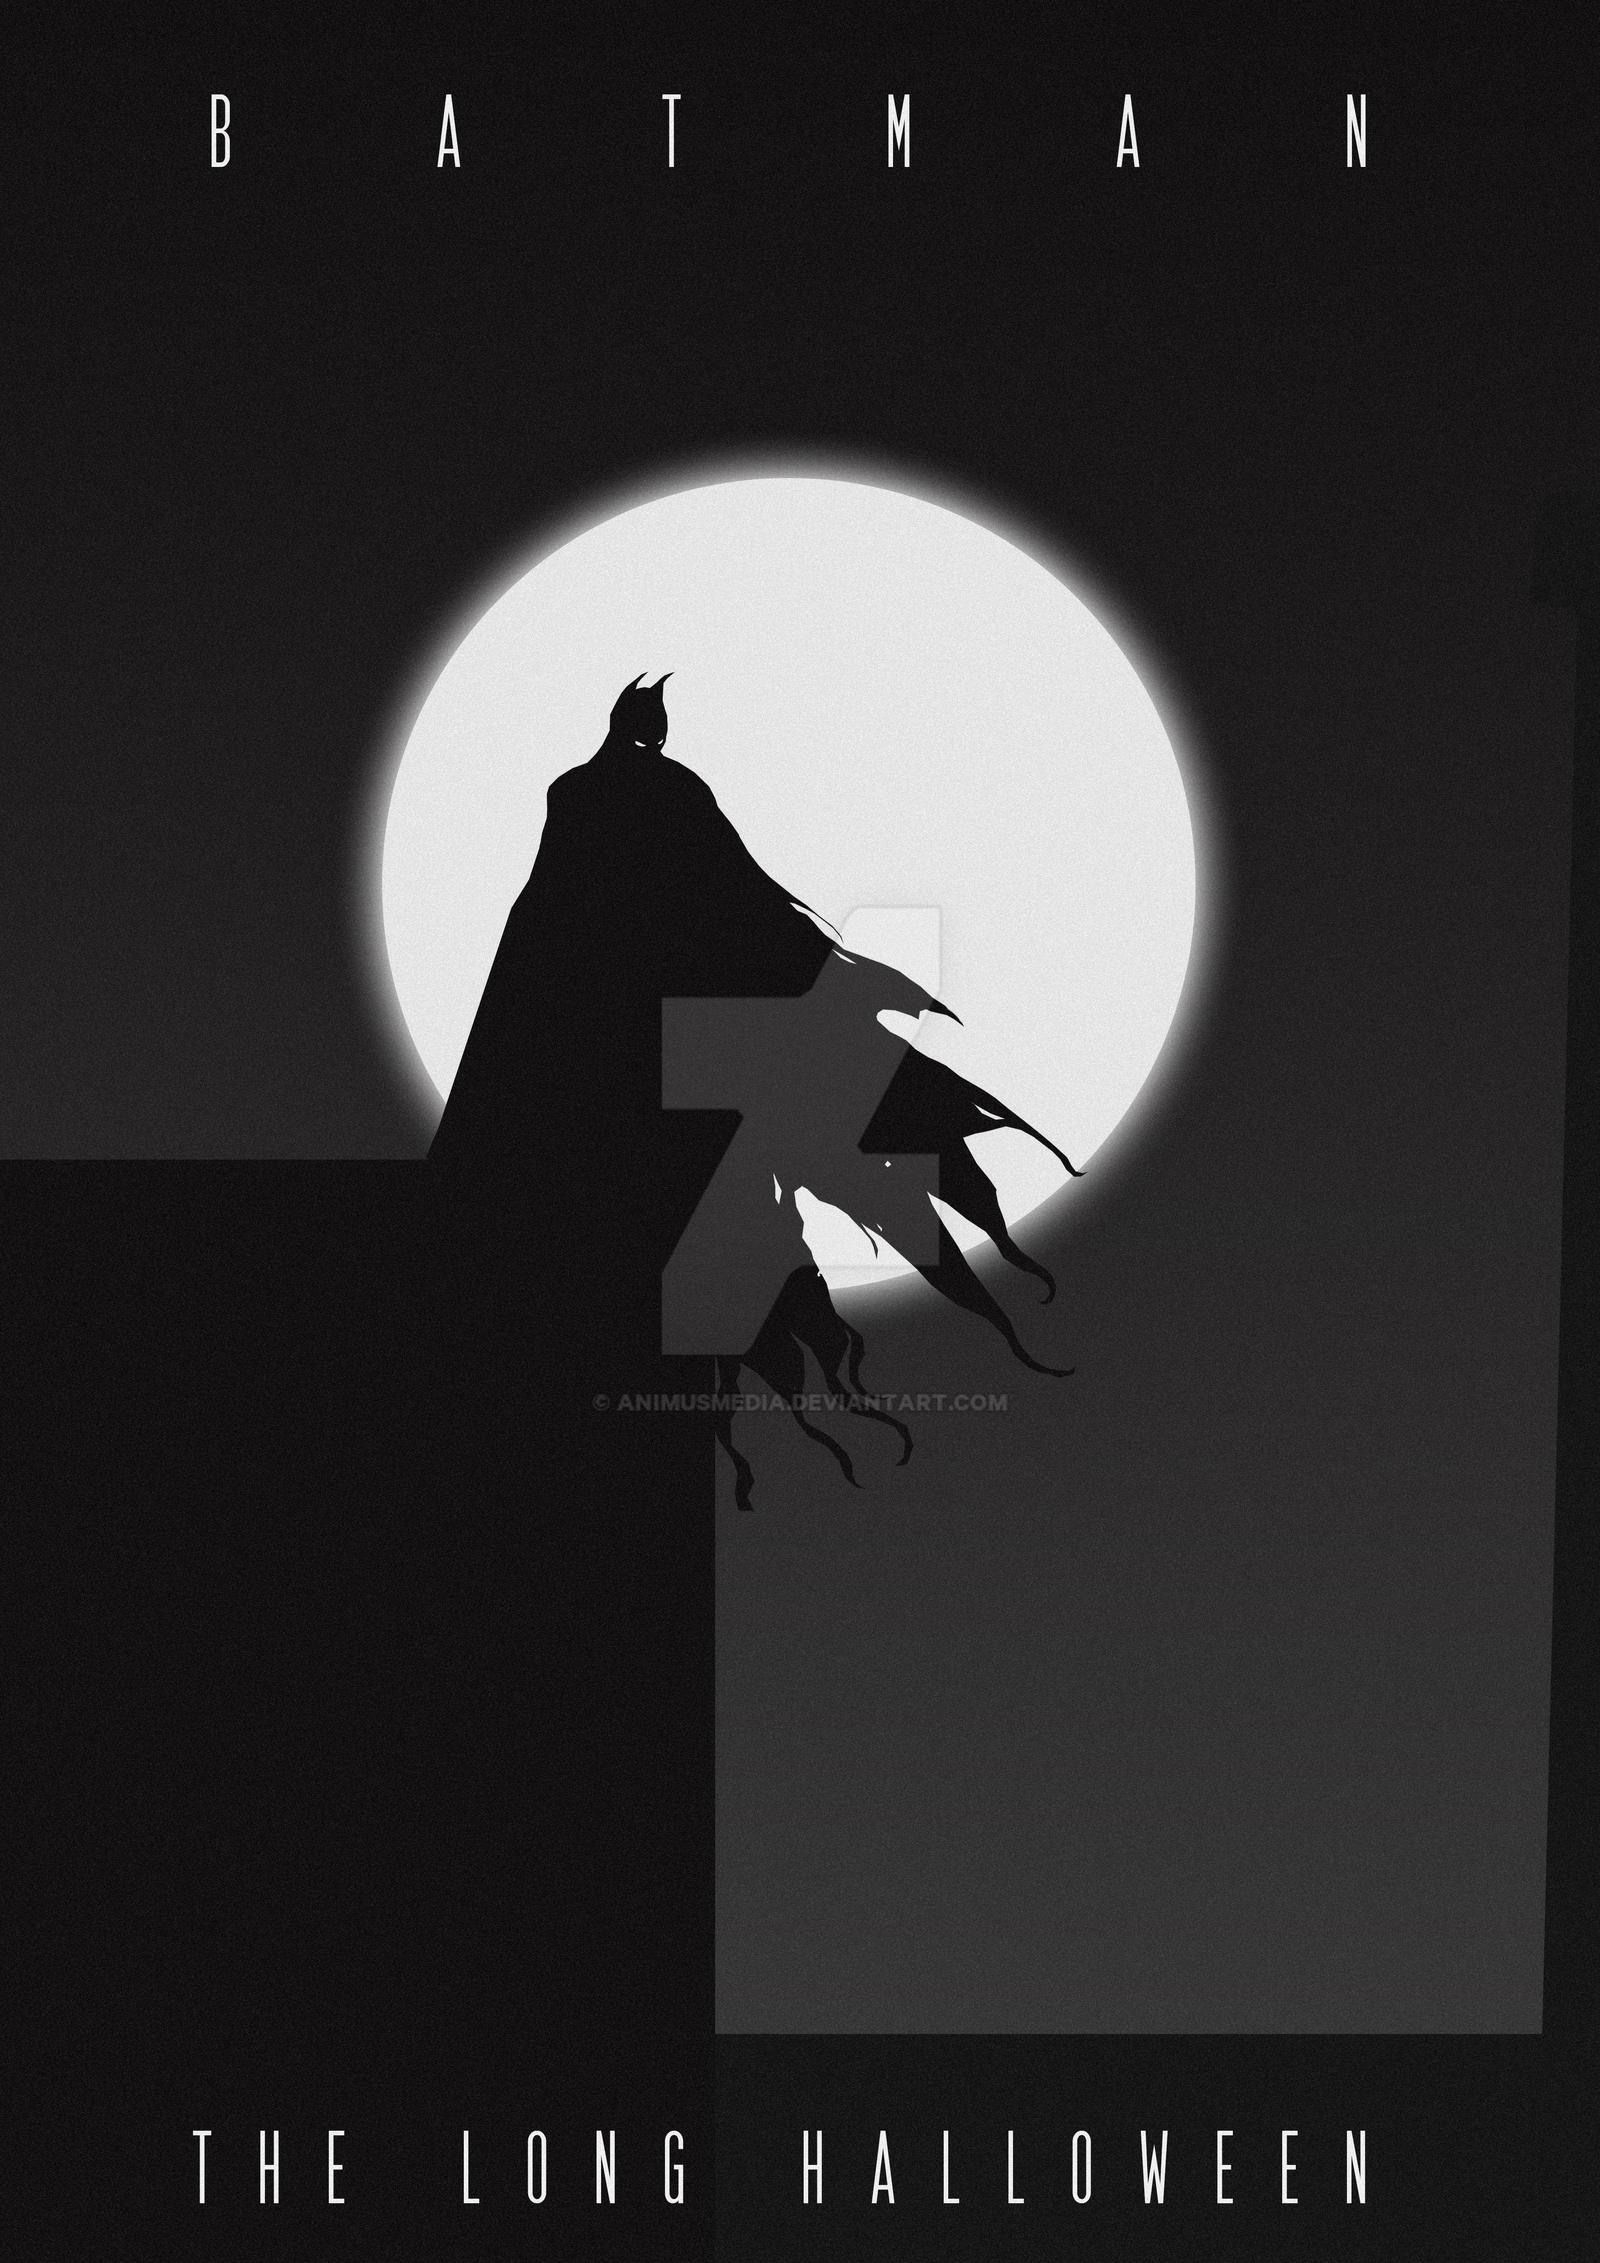 Beautiful Wallpaper Halloween Batman - batman__the_long_halloween_by_animusmedia-d6vxxpr  Snapshot_209164.jpg